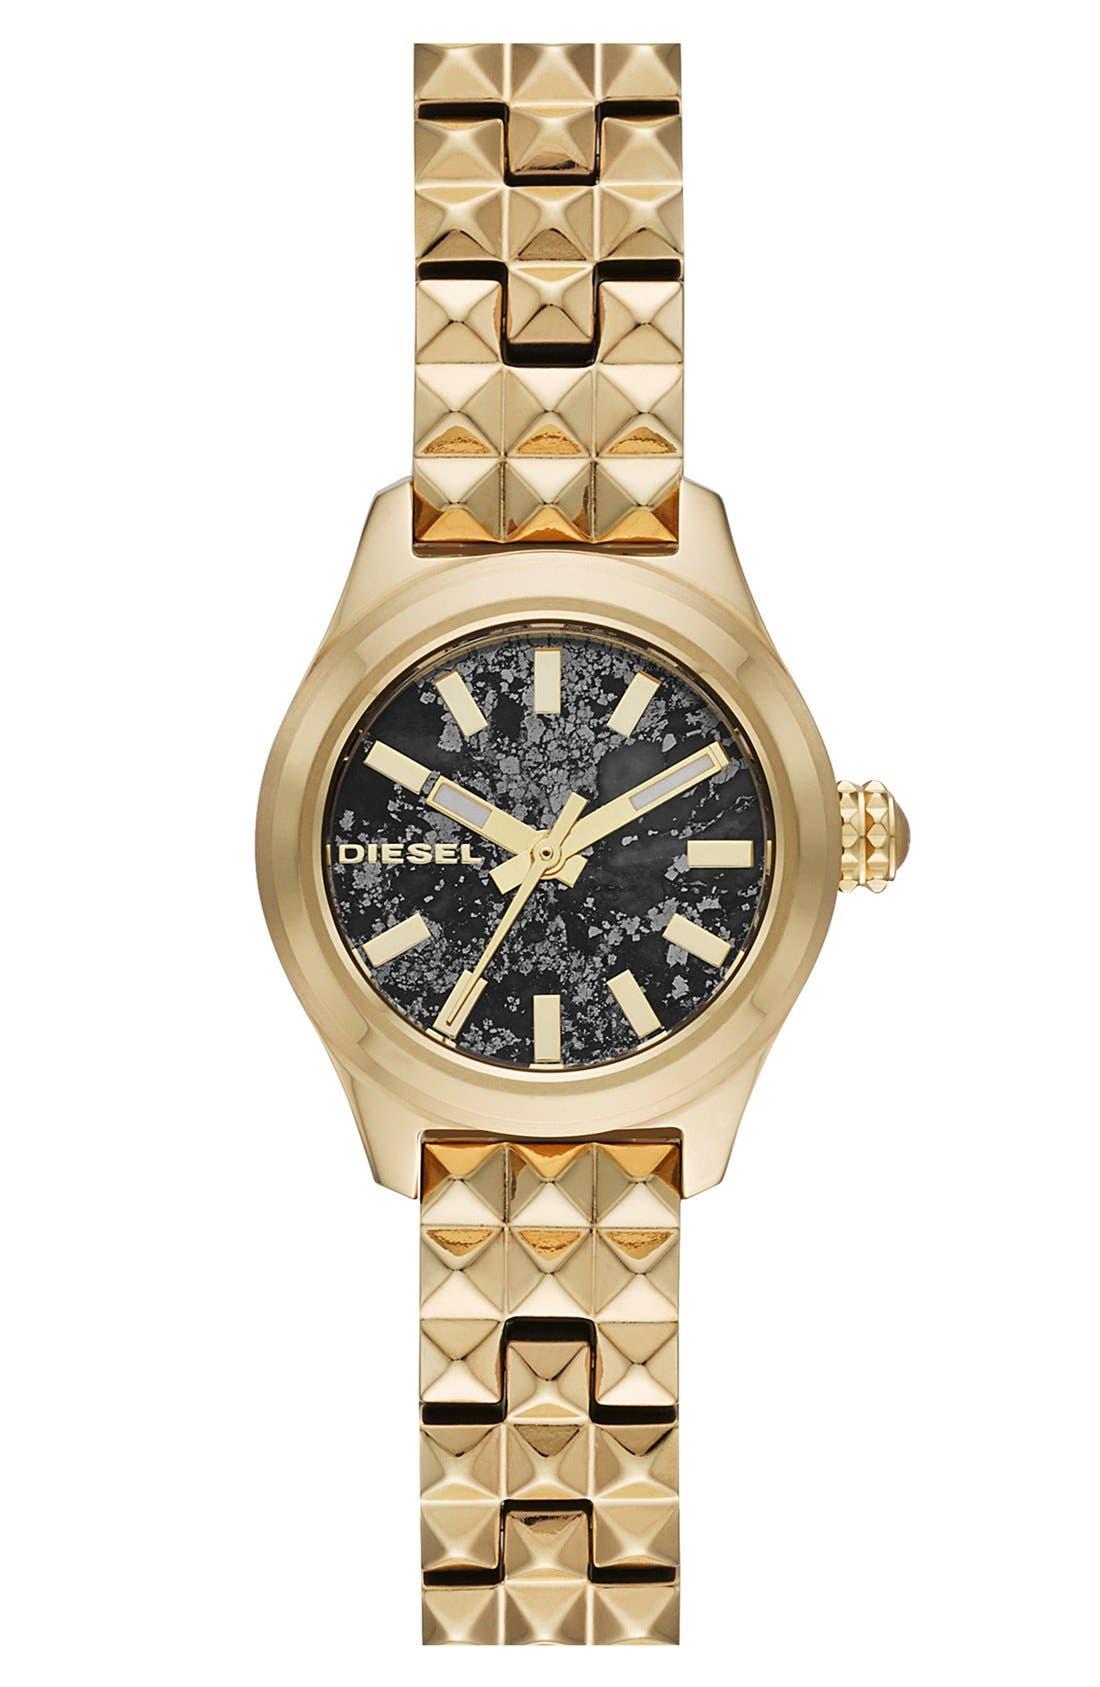 Main Image - DIESEL® 'Kray Kray' Mini Bracelet Watch, 22mm